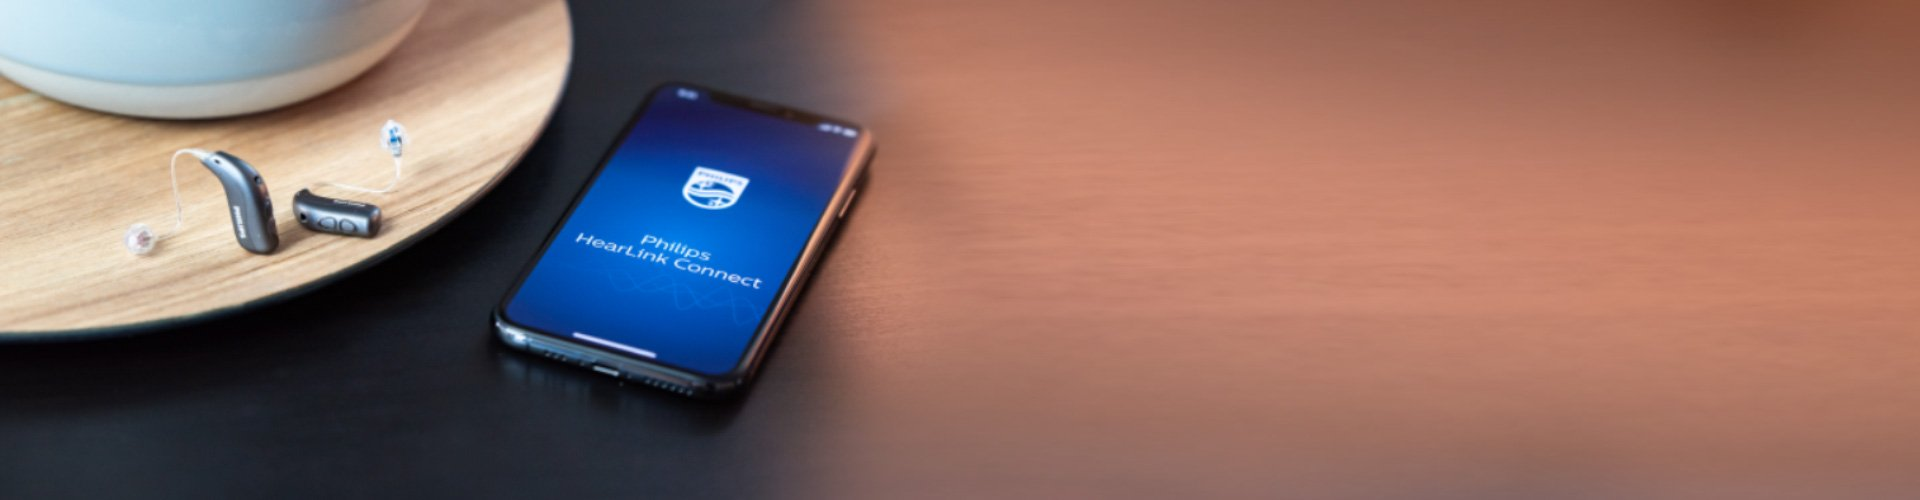 Philips HearLink Connect アプリを開いたスマートフォンとフィリップス ヒアリンク補聴器